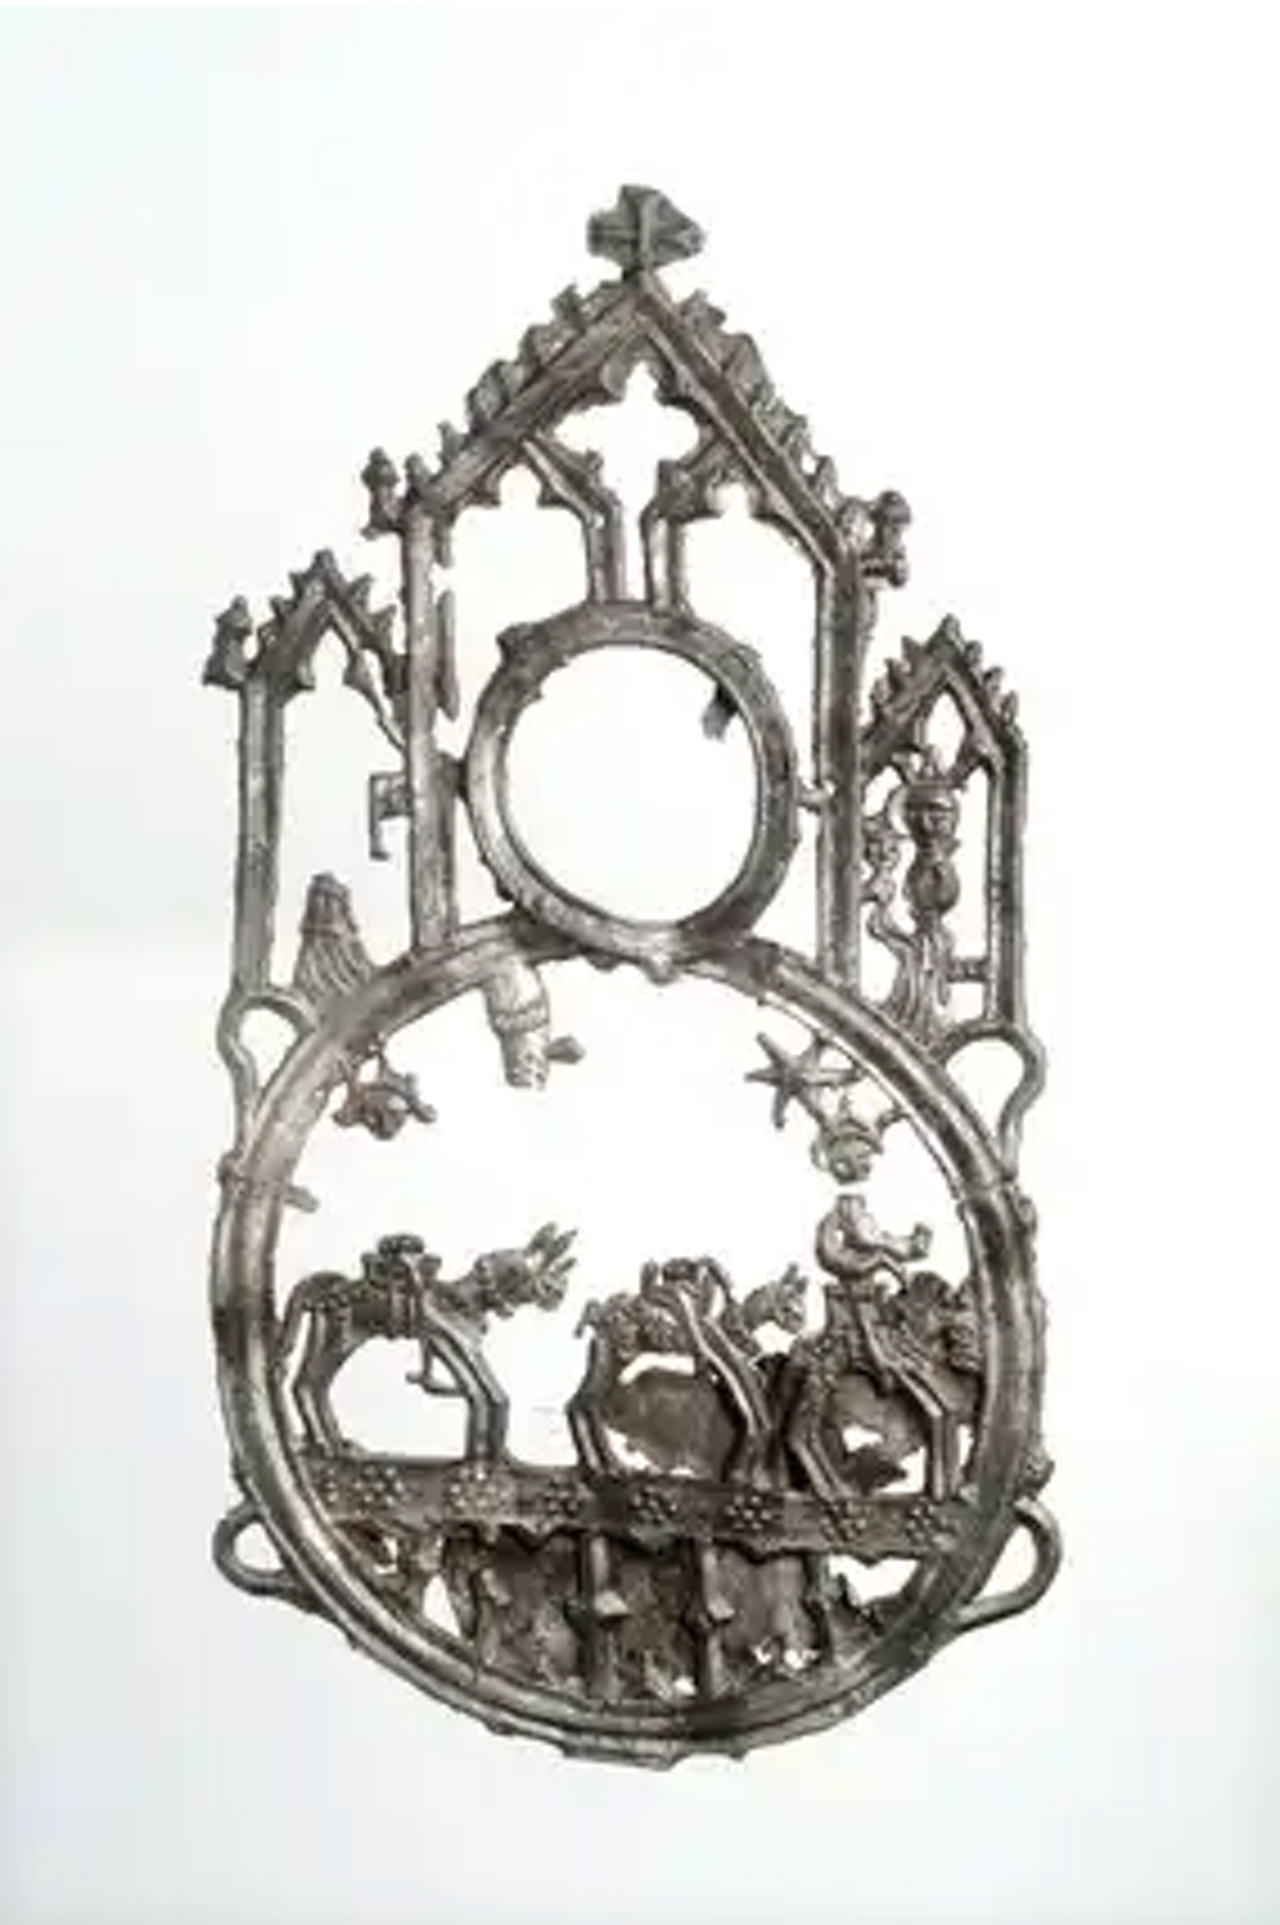 Three kings pilgrim badge, 15th century